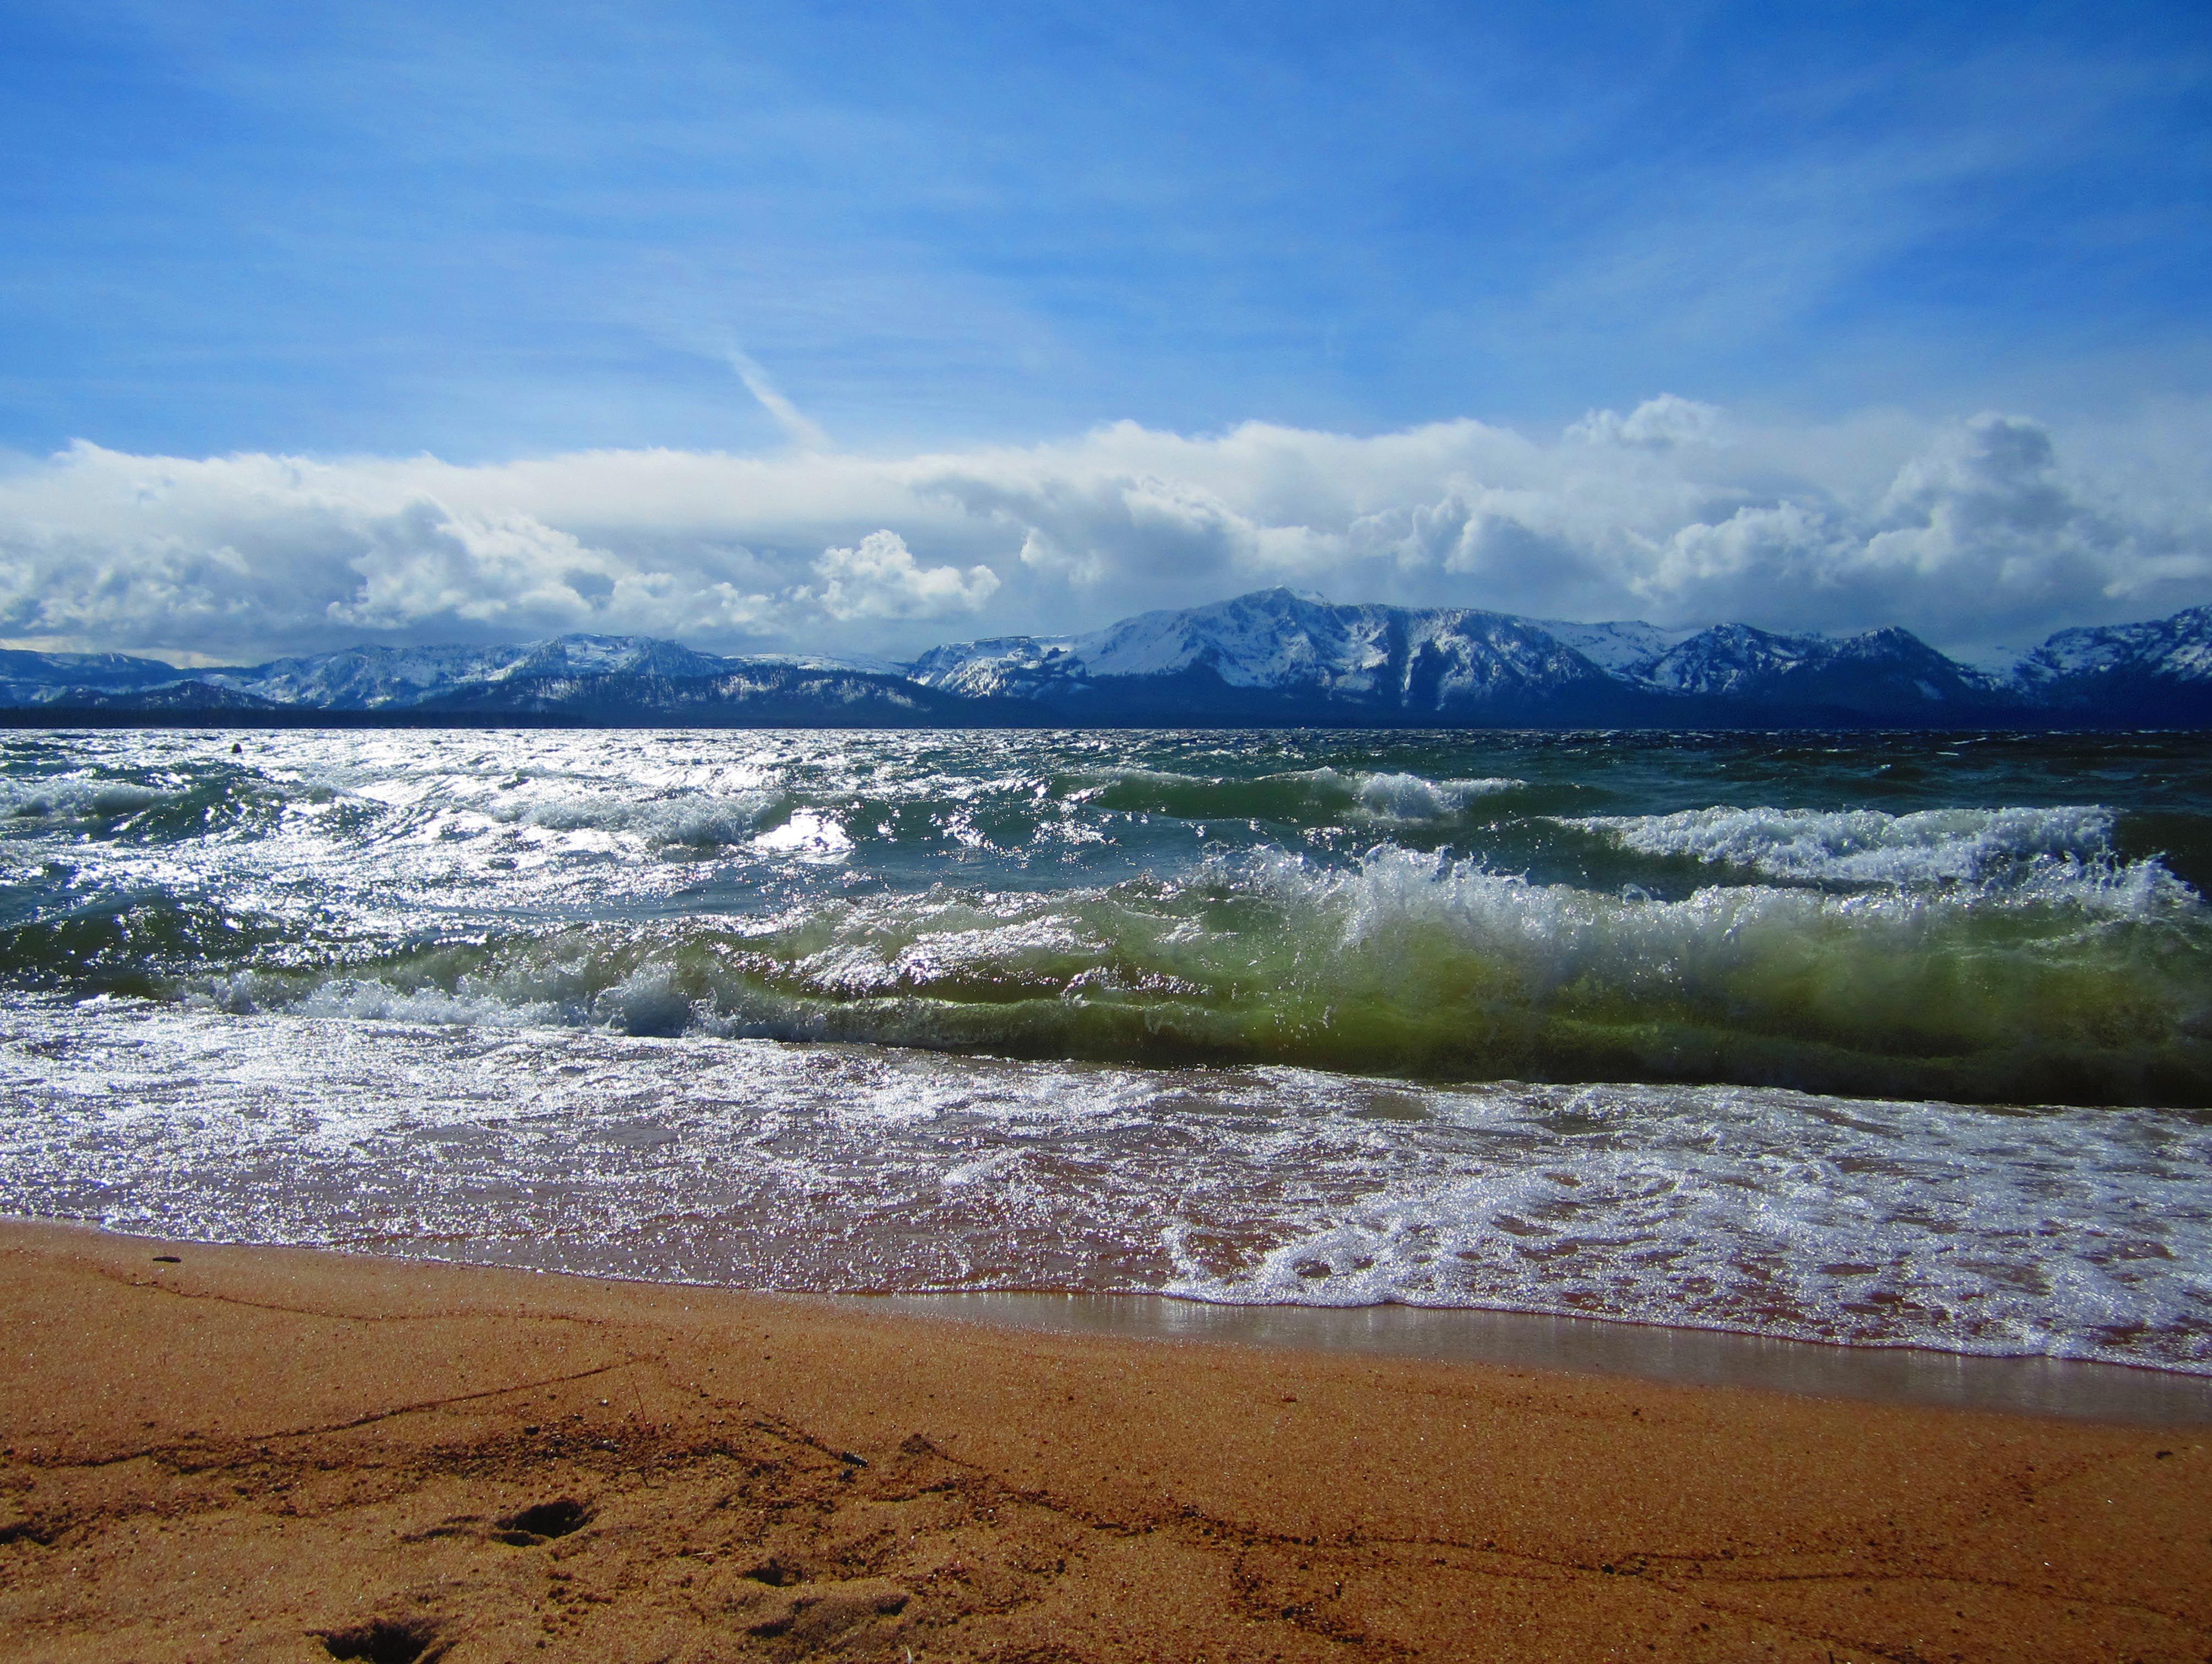 Windy Day In May From Nevada Beach Photo Lmalcom Www Buckinghamtaentals